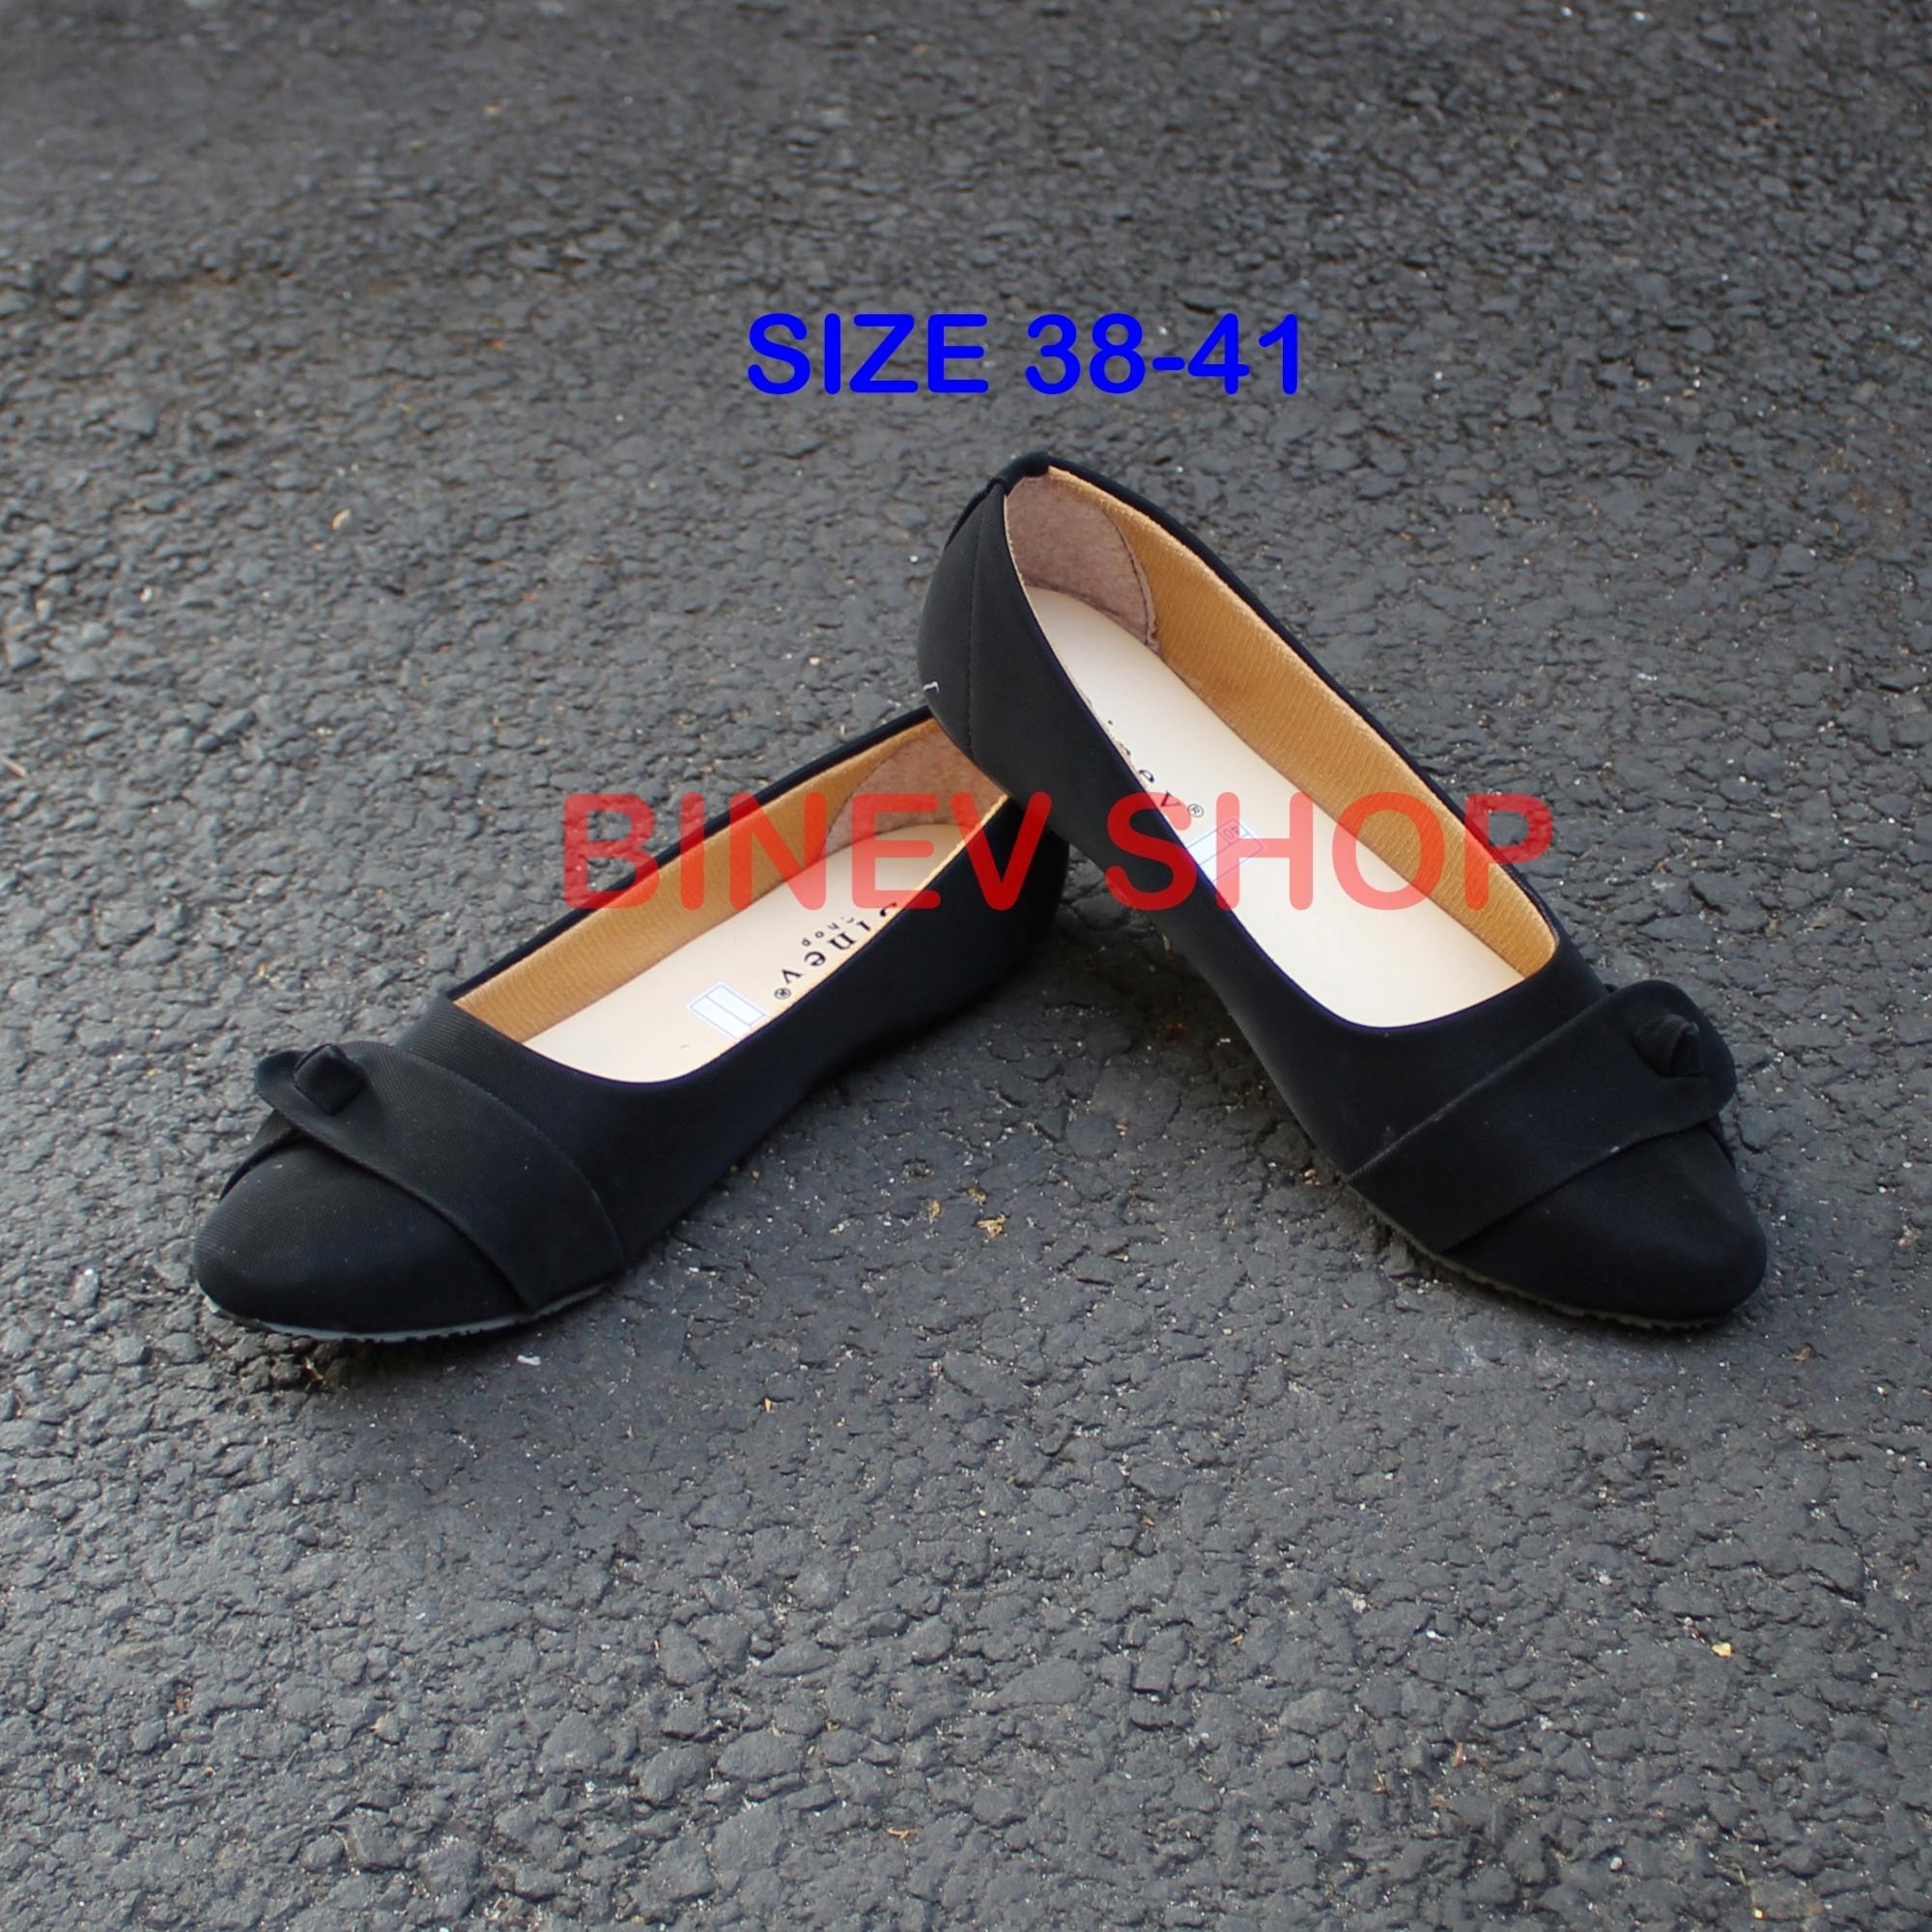 Binev Sepatu Slip On Wanita Develop 0010 Blue Update Daftar Harga Source · Binev Sepatu Slip On Wanita B 042 PITA01 3